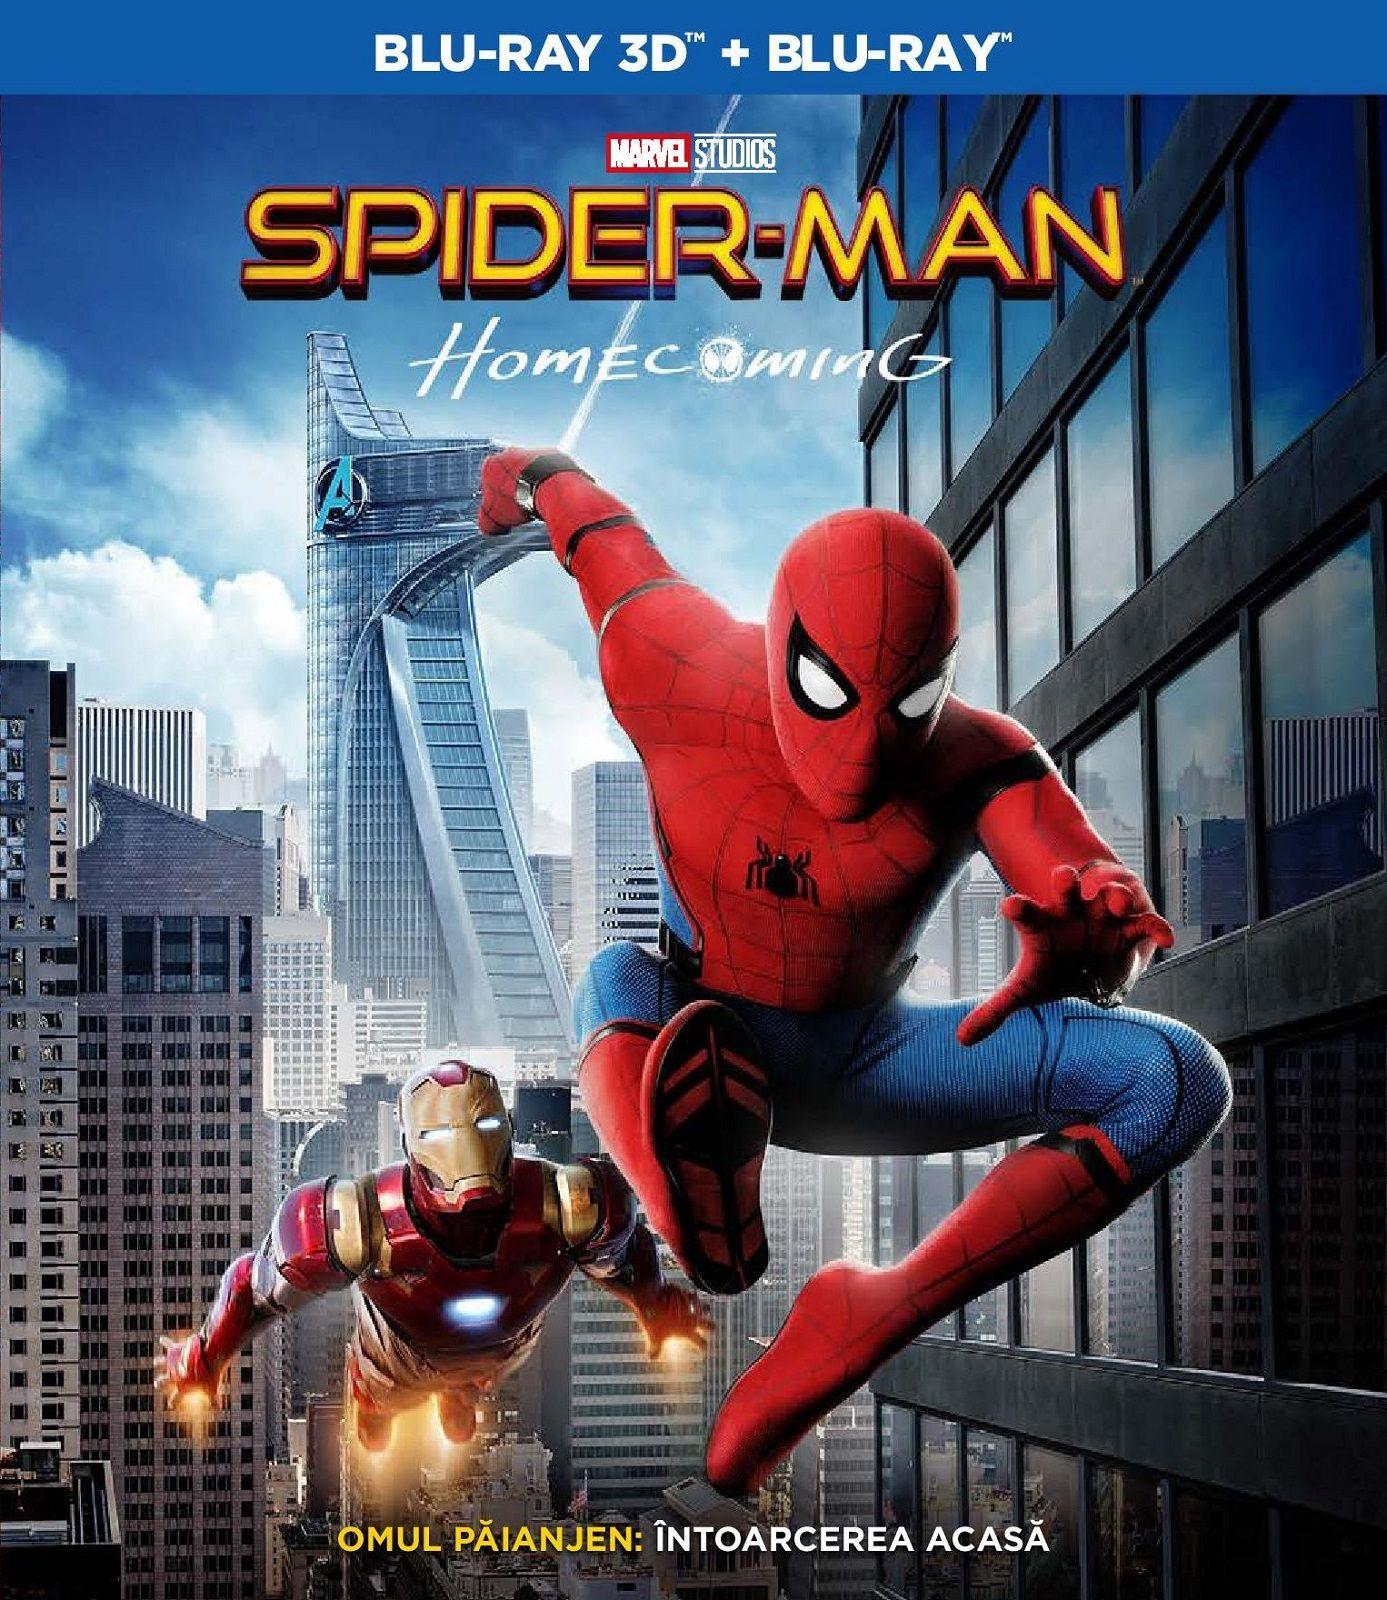 Спайдър-мен: Завръщане у дома 3D+2D (Blu-Ray) - 1